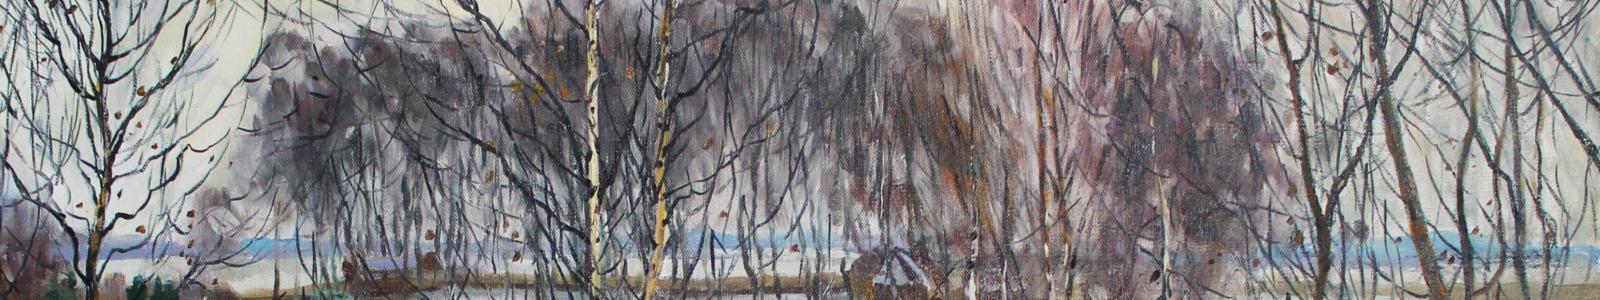 Gallery Painter Natalia Myrauyova